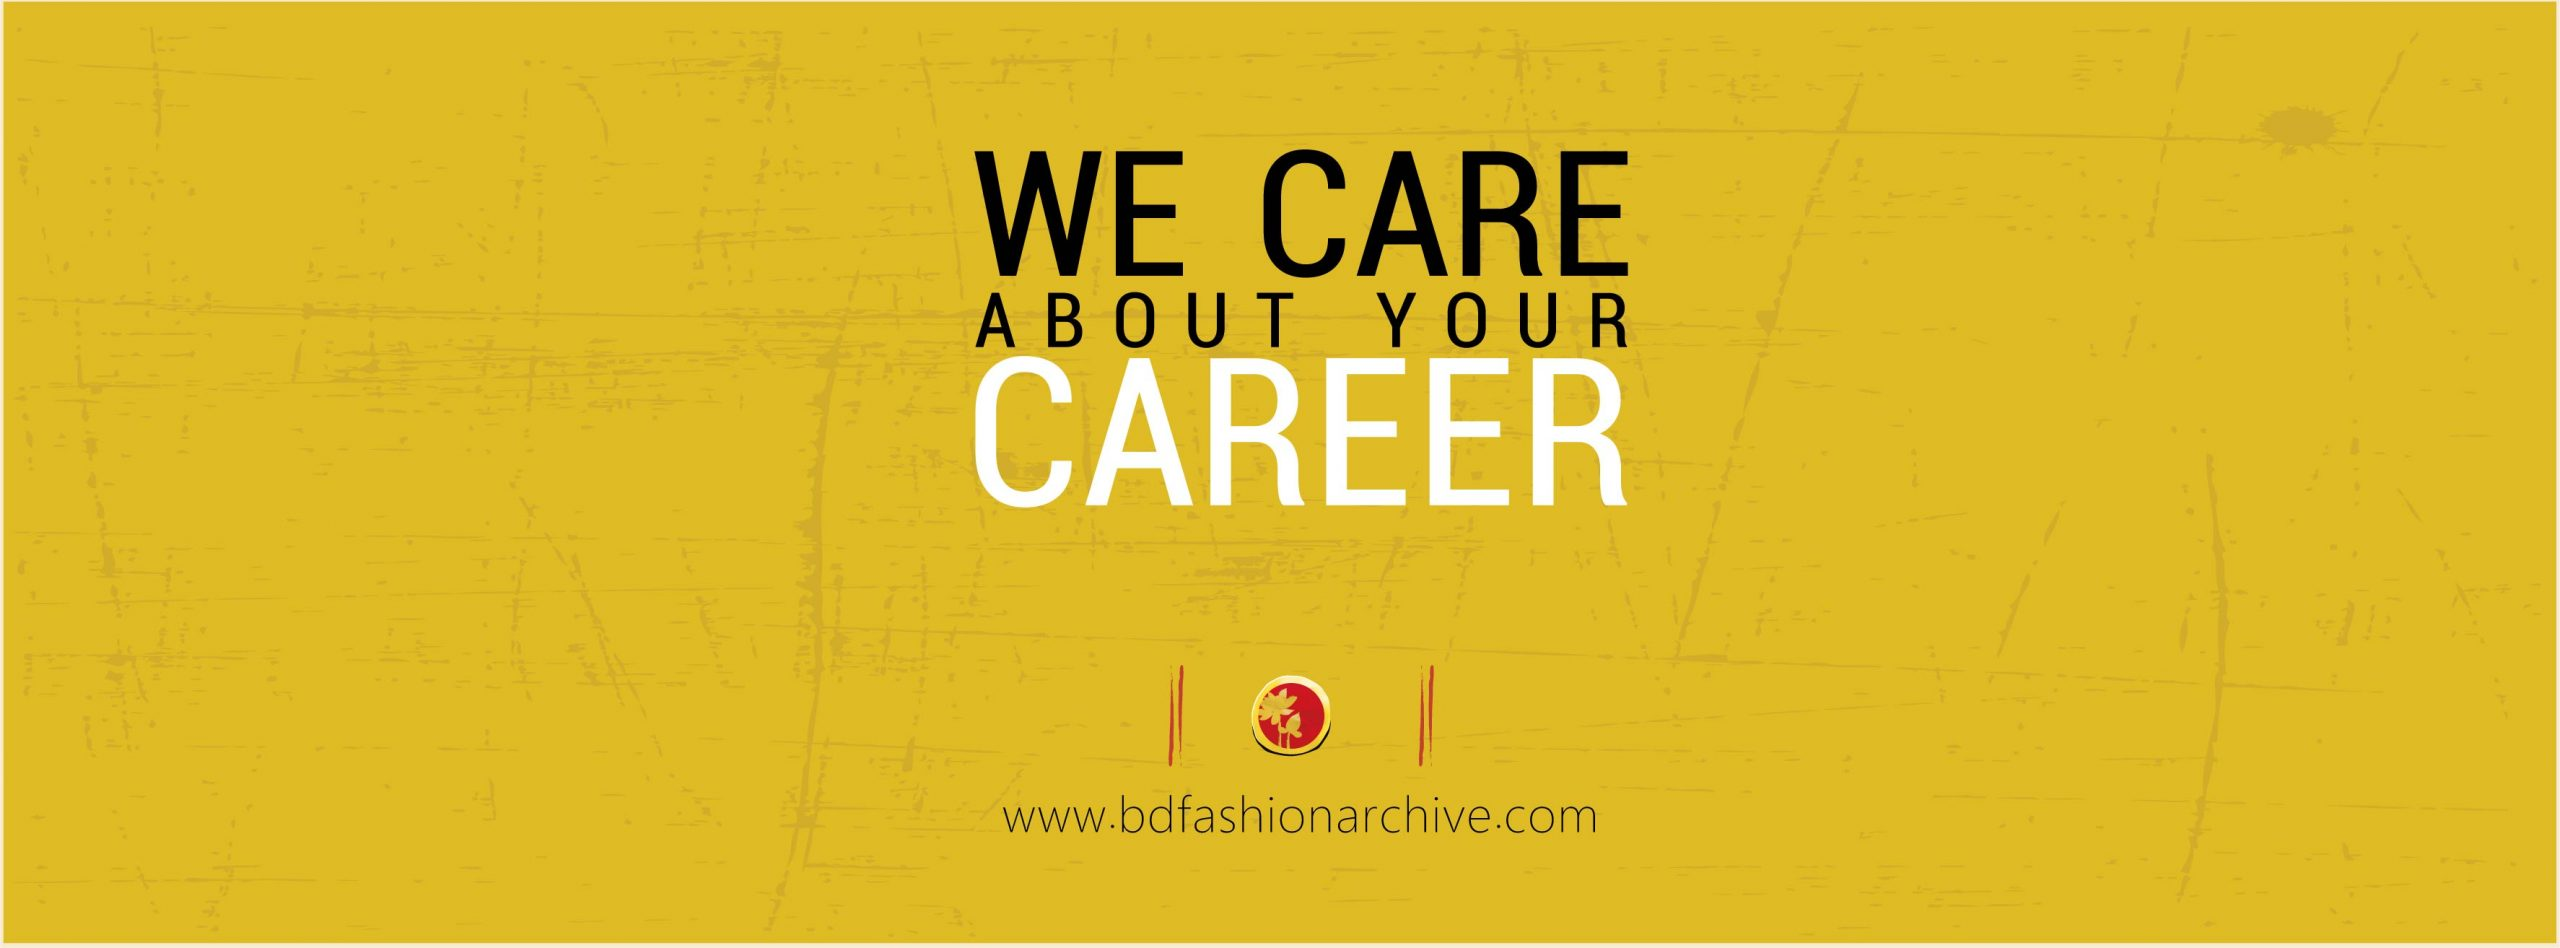 career bangladesh fashion archive